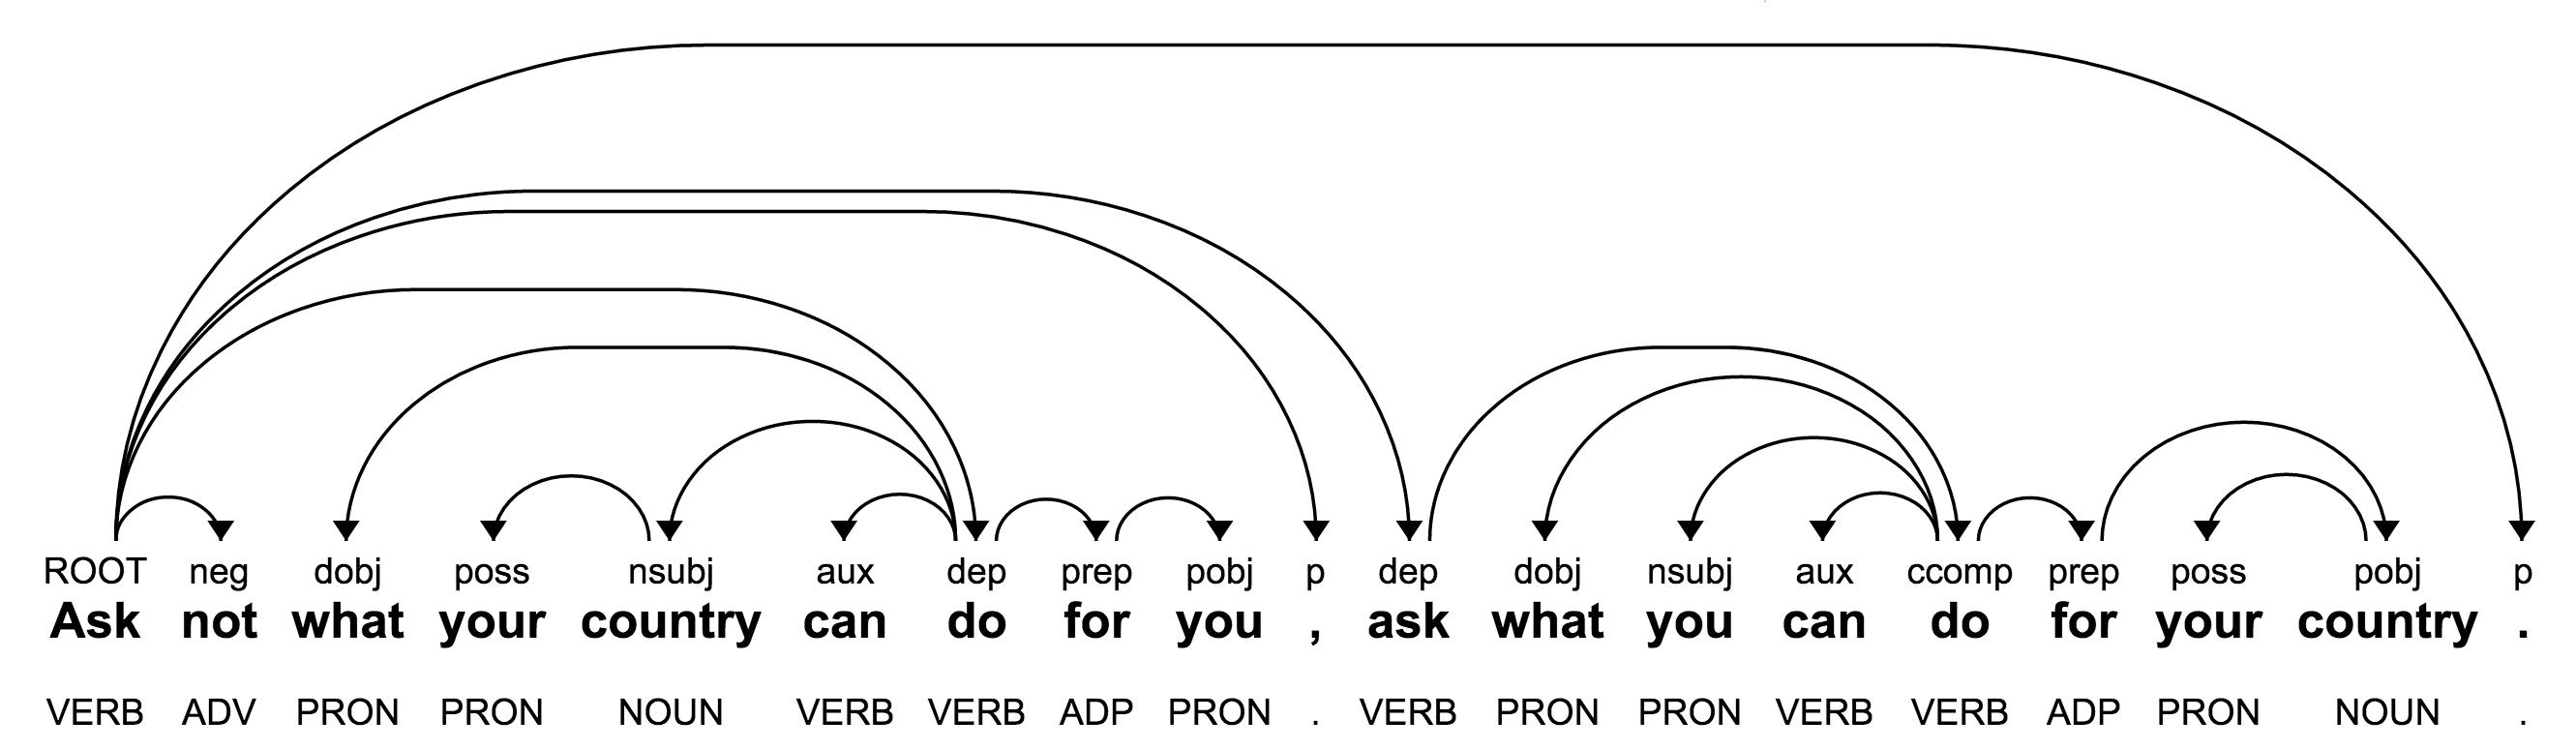 Morphology & Dependency Trees | Cloud Natural Language API | Google